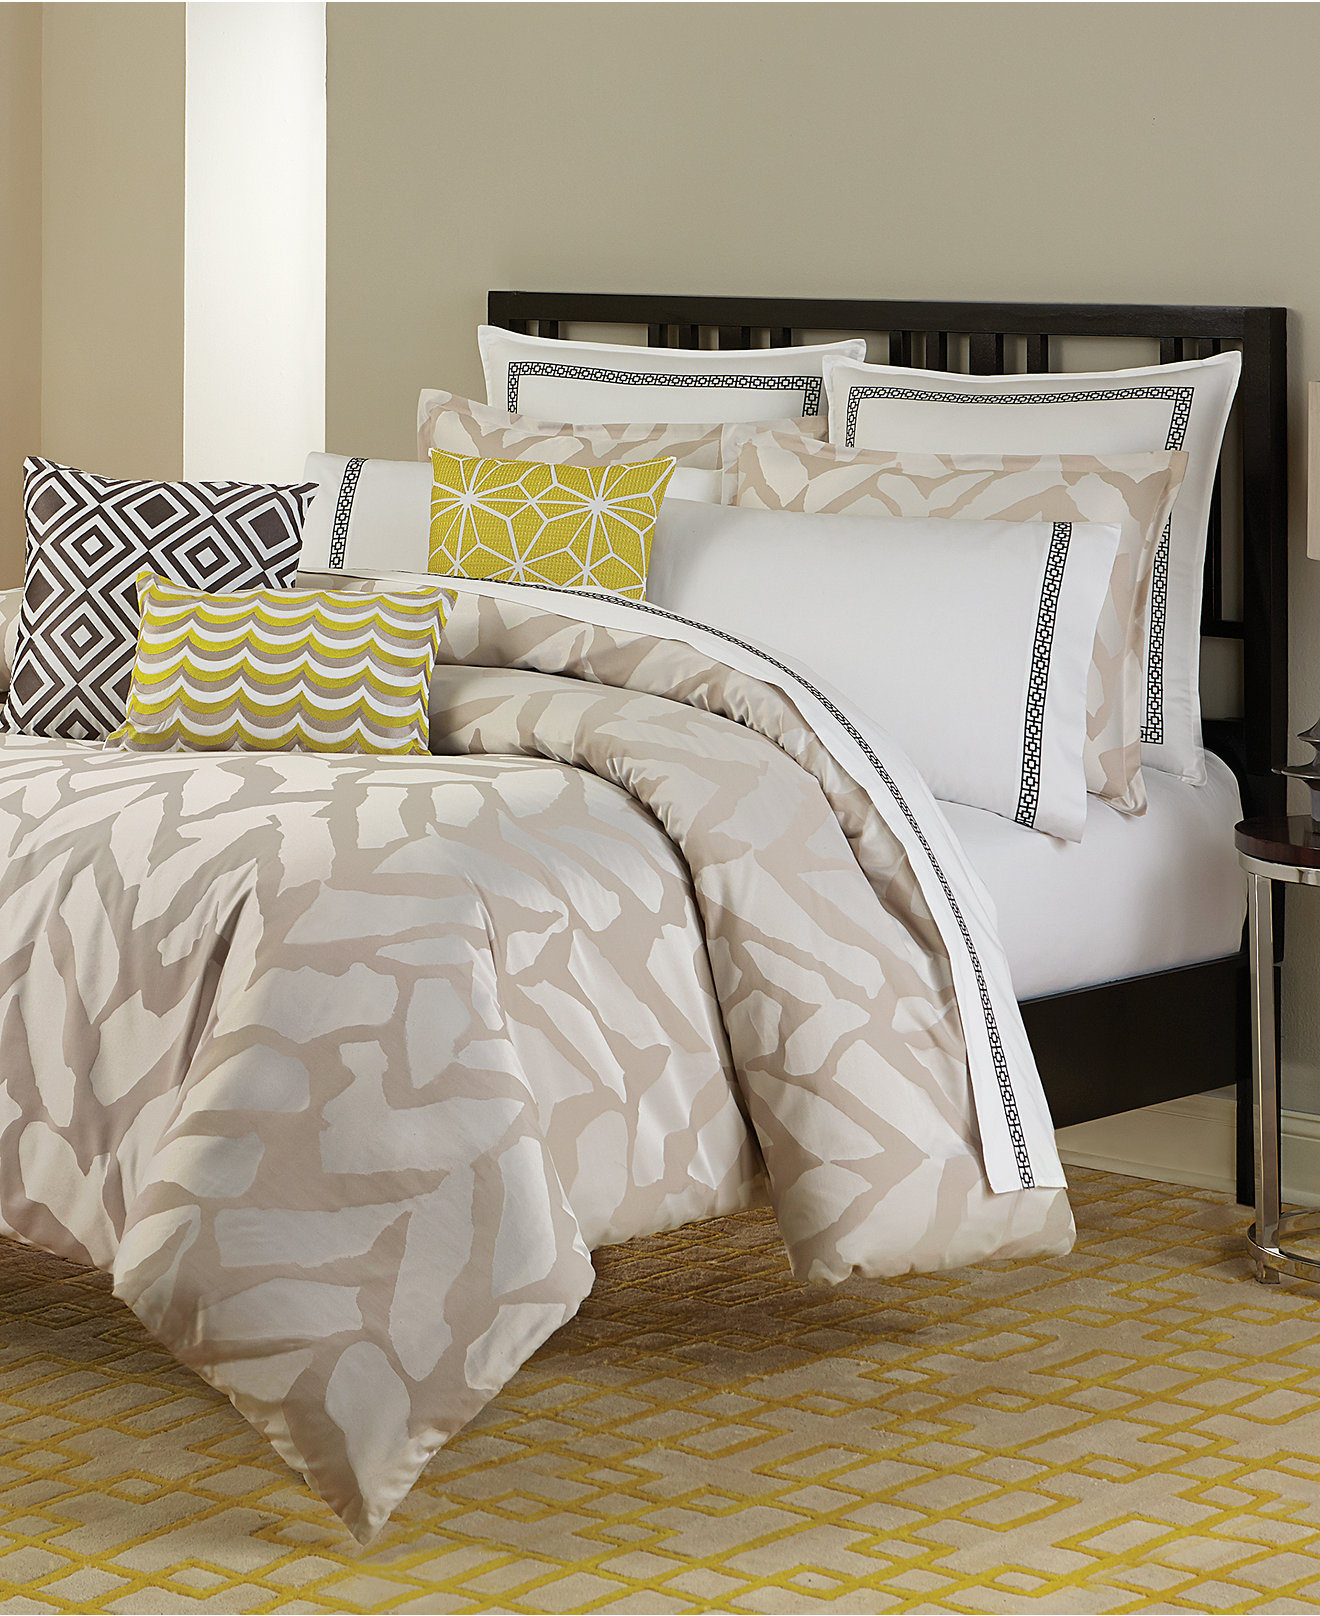 Trina turk bedding - Trina Turk Giraffe Comforter And Duvet Sets Bedding Collections Bed Bath Macy S